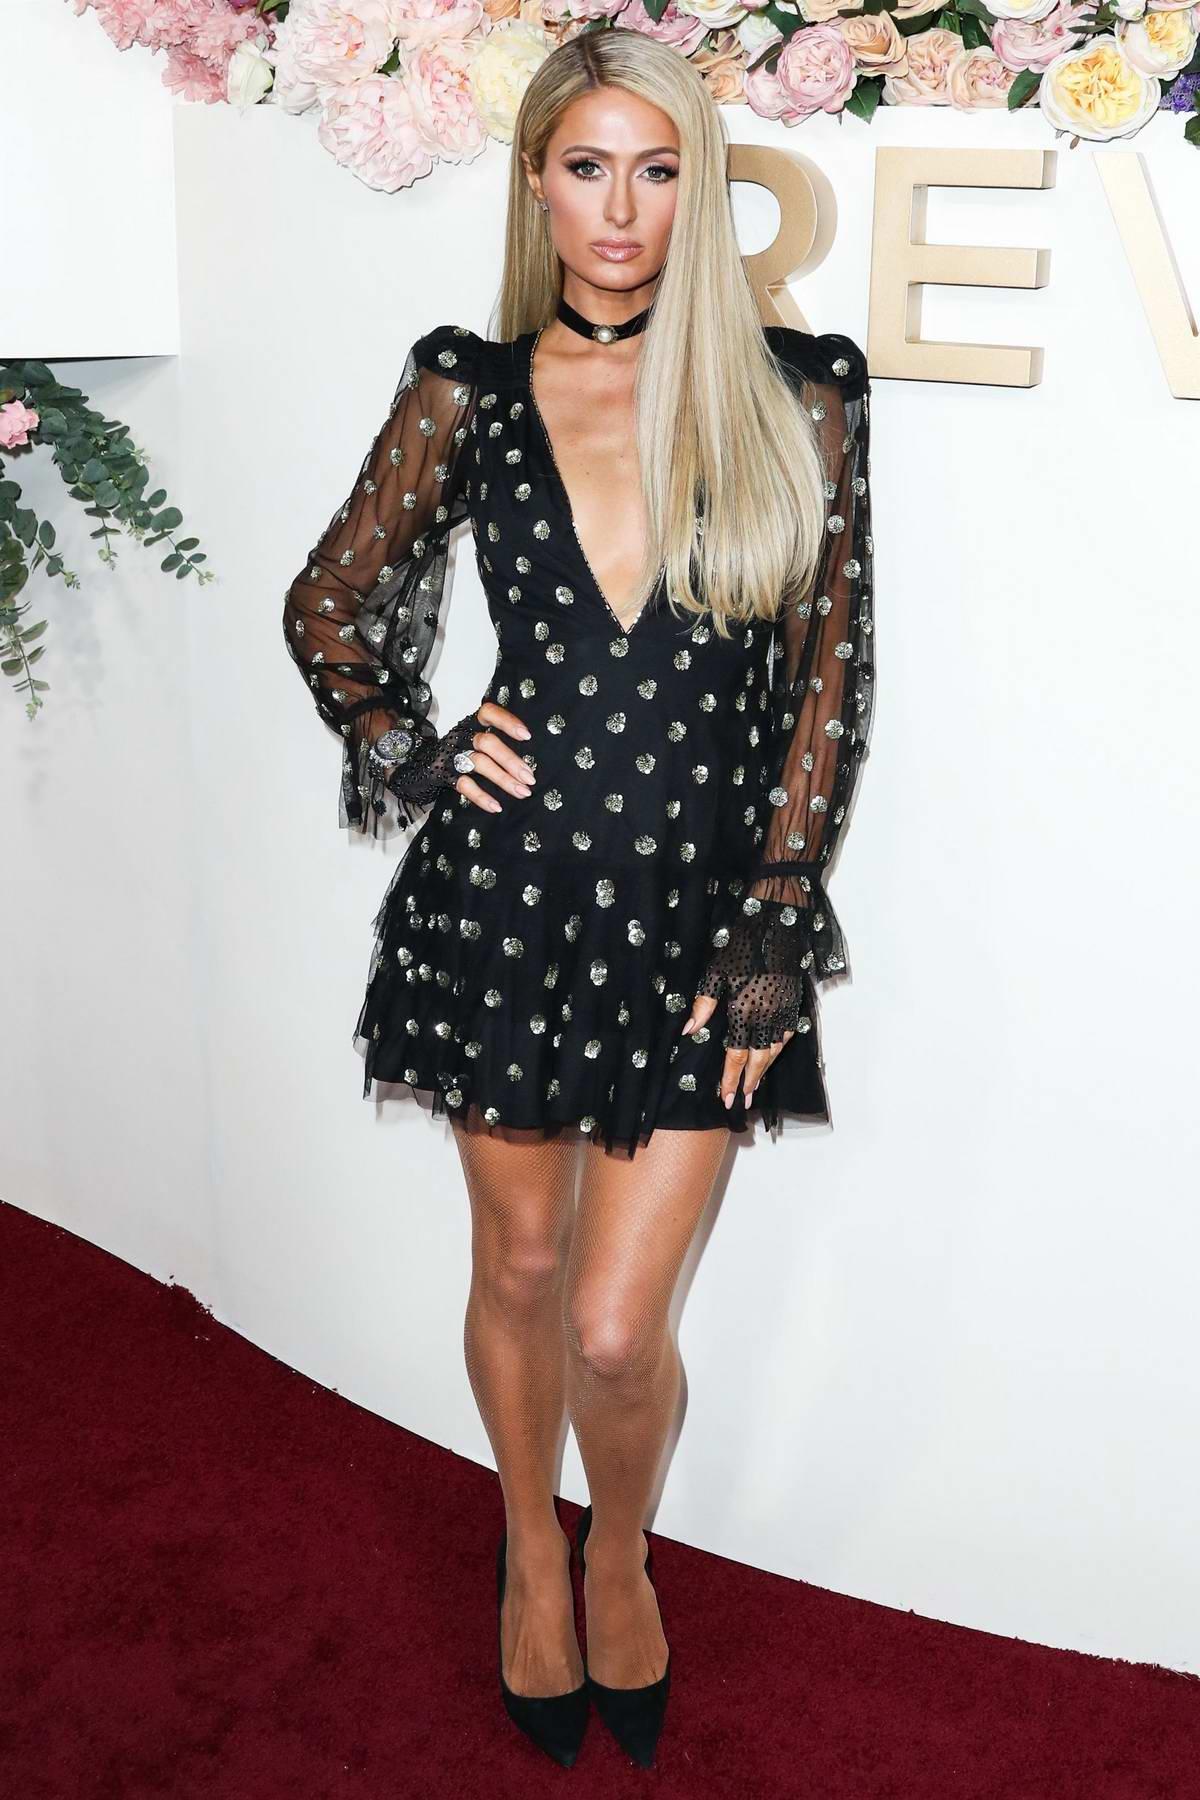 Paris Hilton attends the 3rd Annual REVOLVE Awards at Goya Studios in Hollywood, California